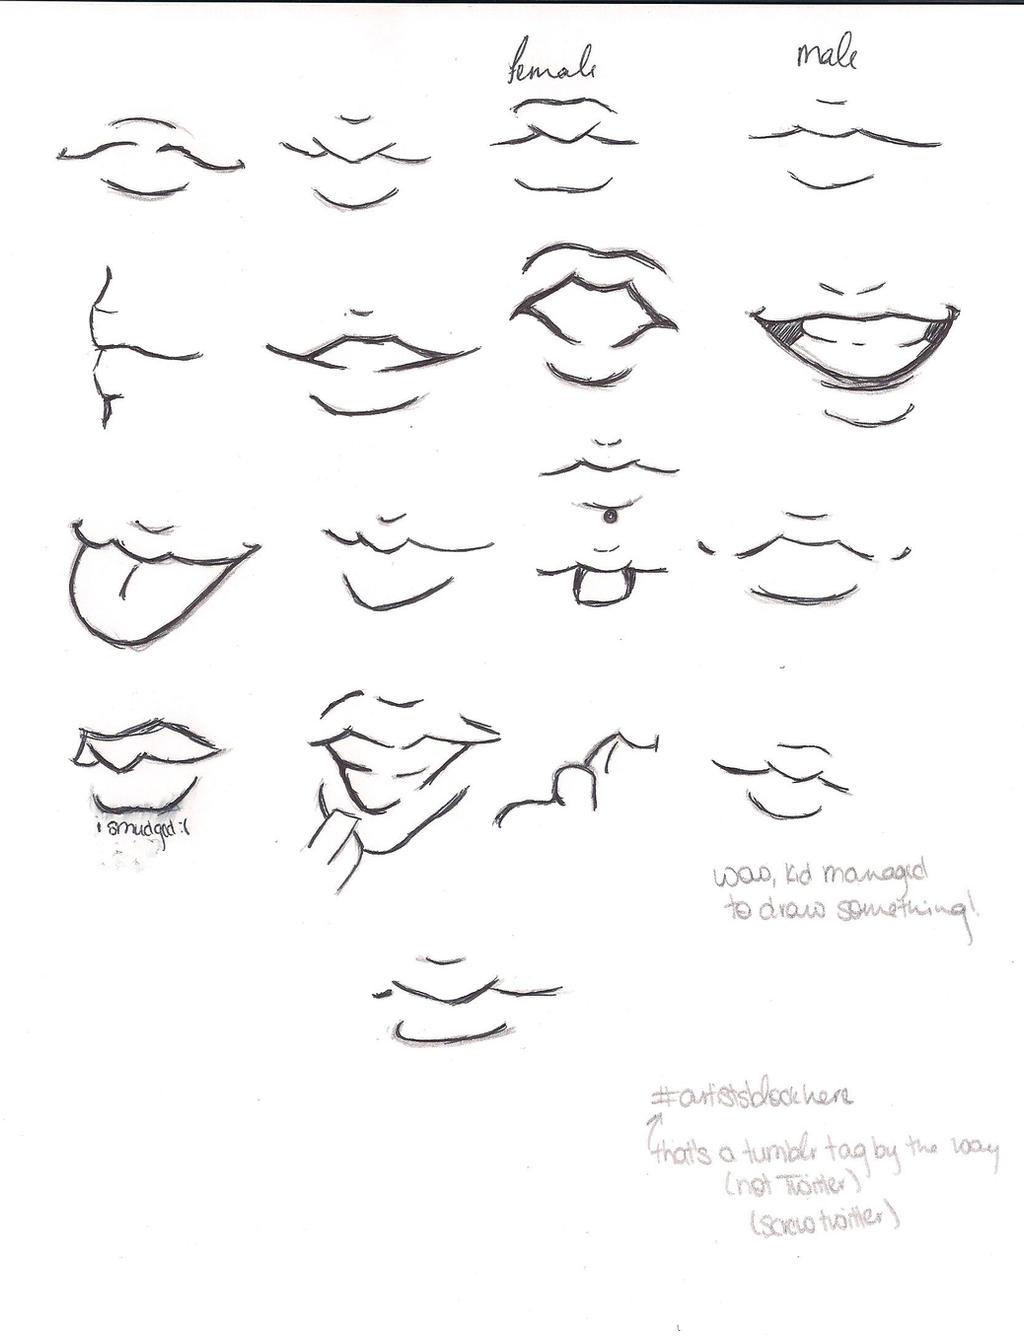 Lip References By Ibrokegimp On Deviantart